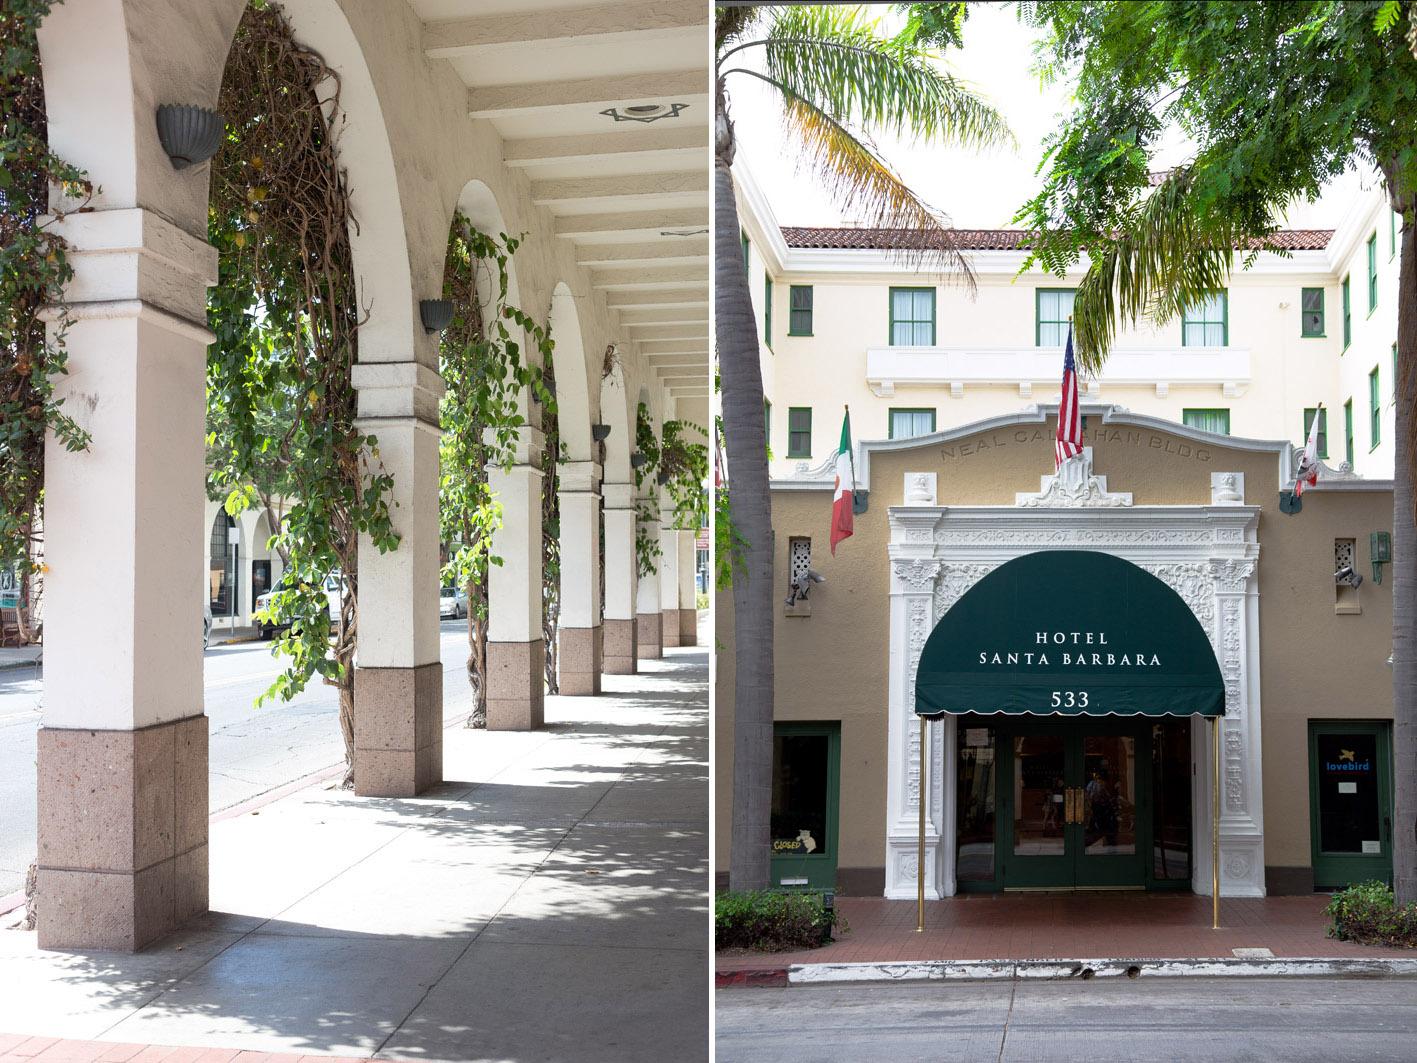 the hotel santa barbara